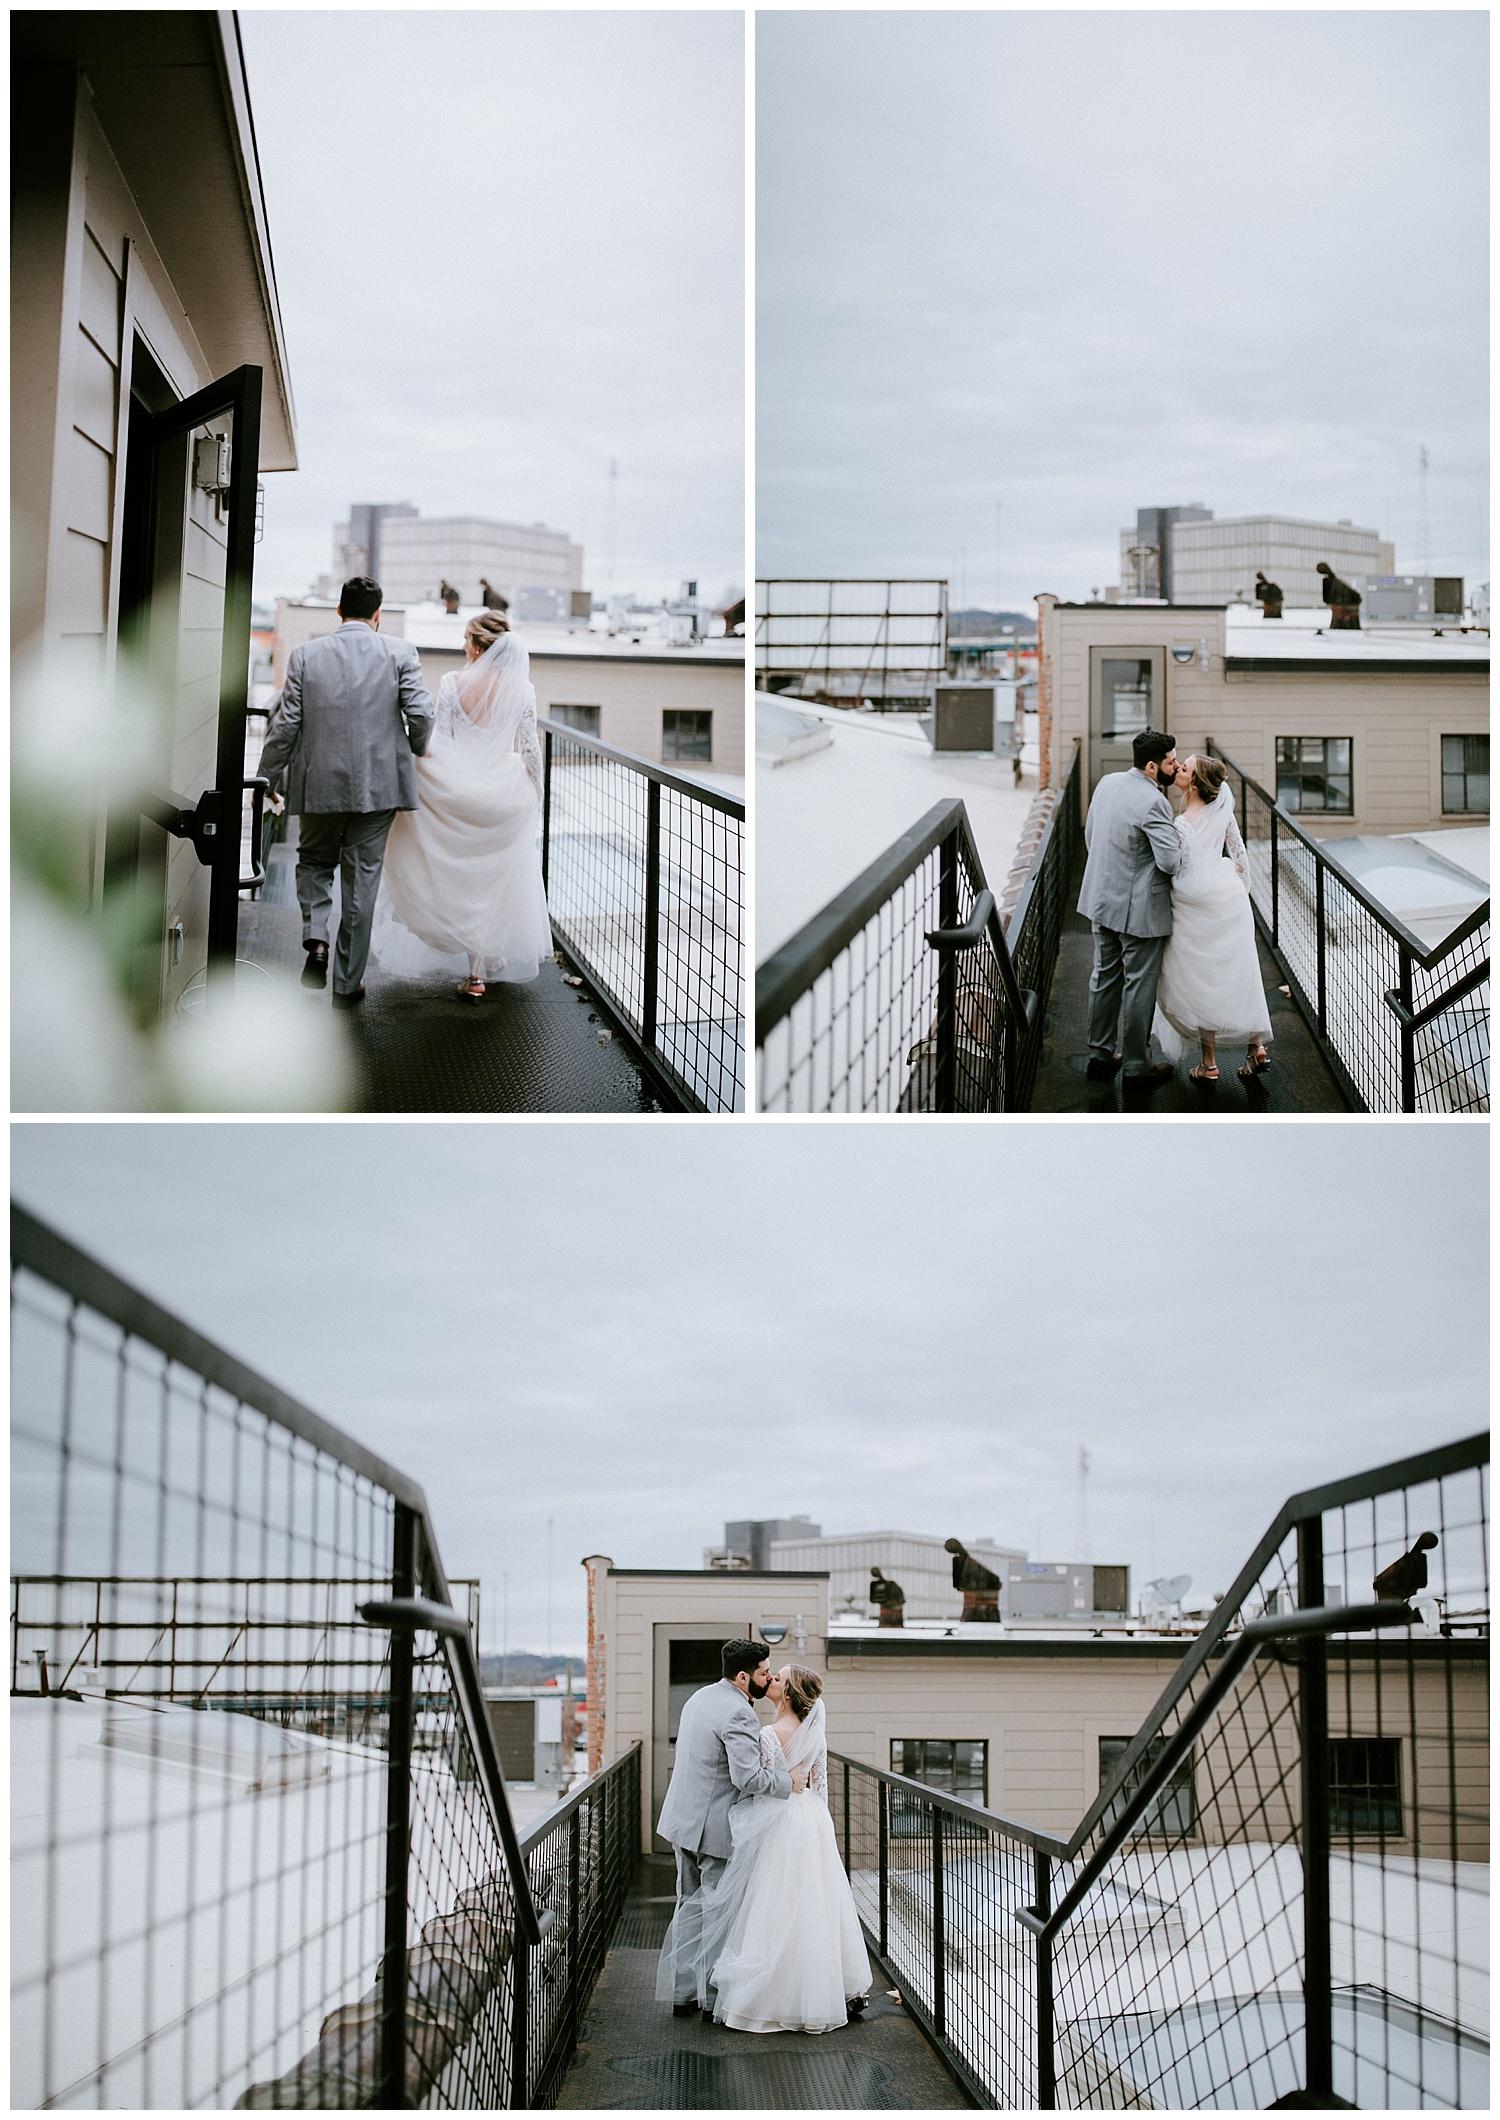 winter-wedding-the standard-knoxville_2019-01-23_0033.jpg